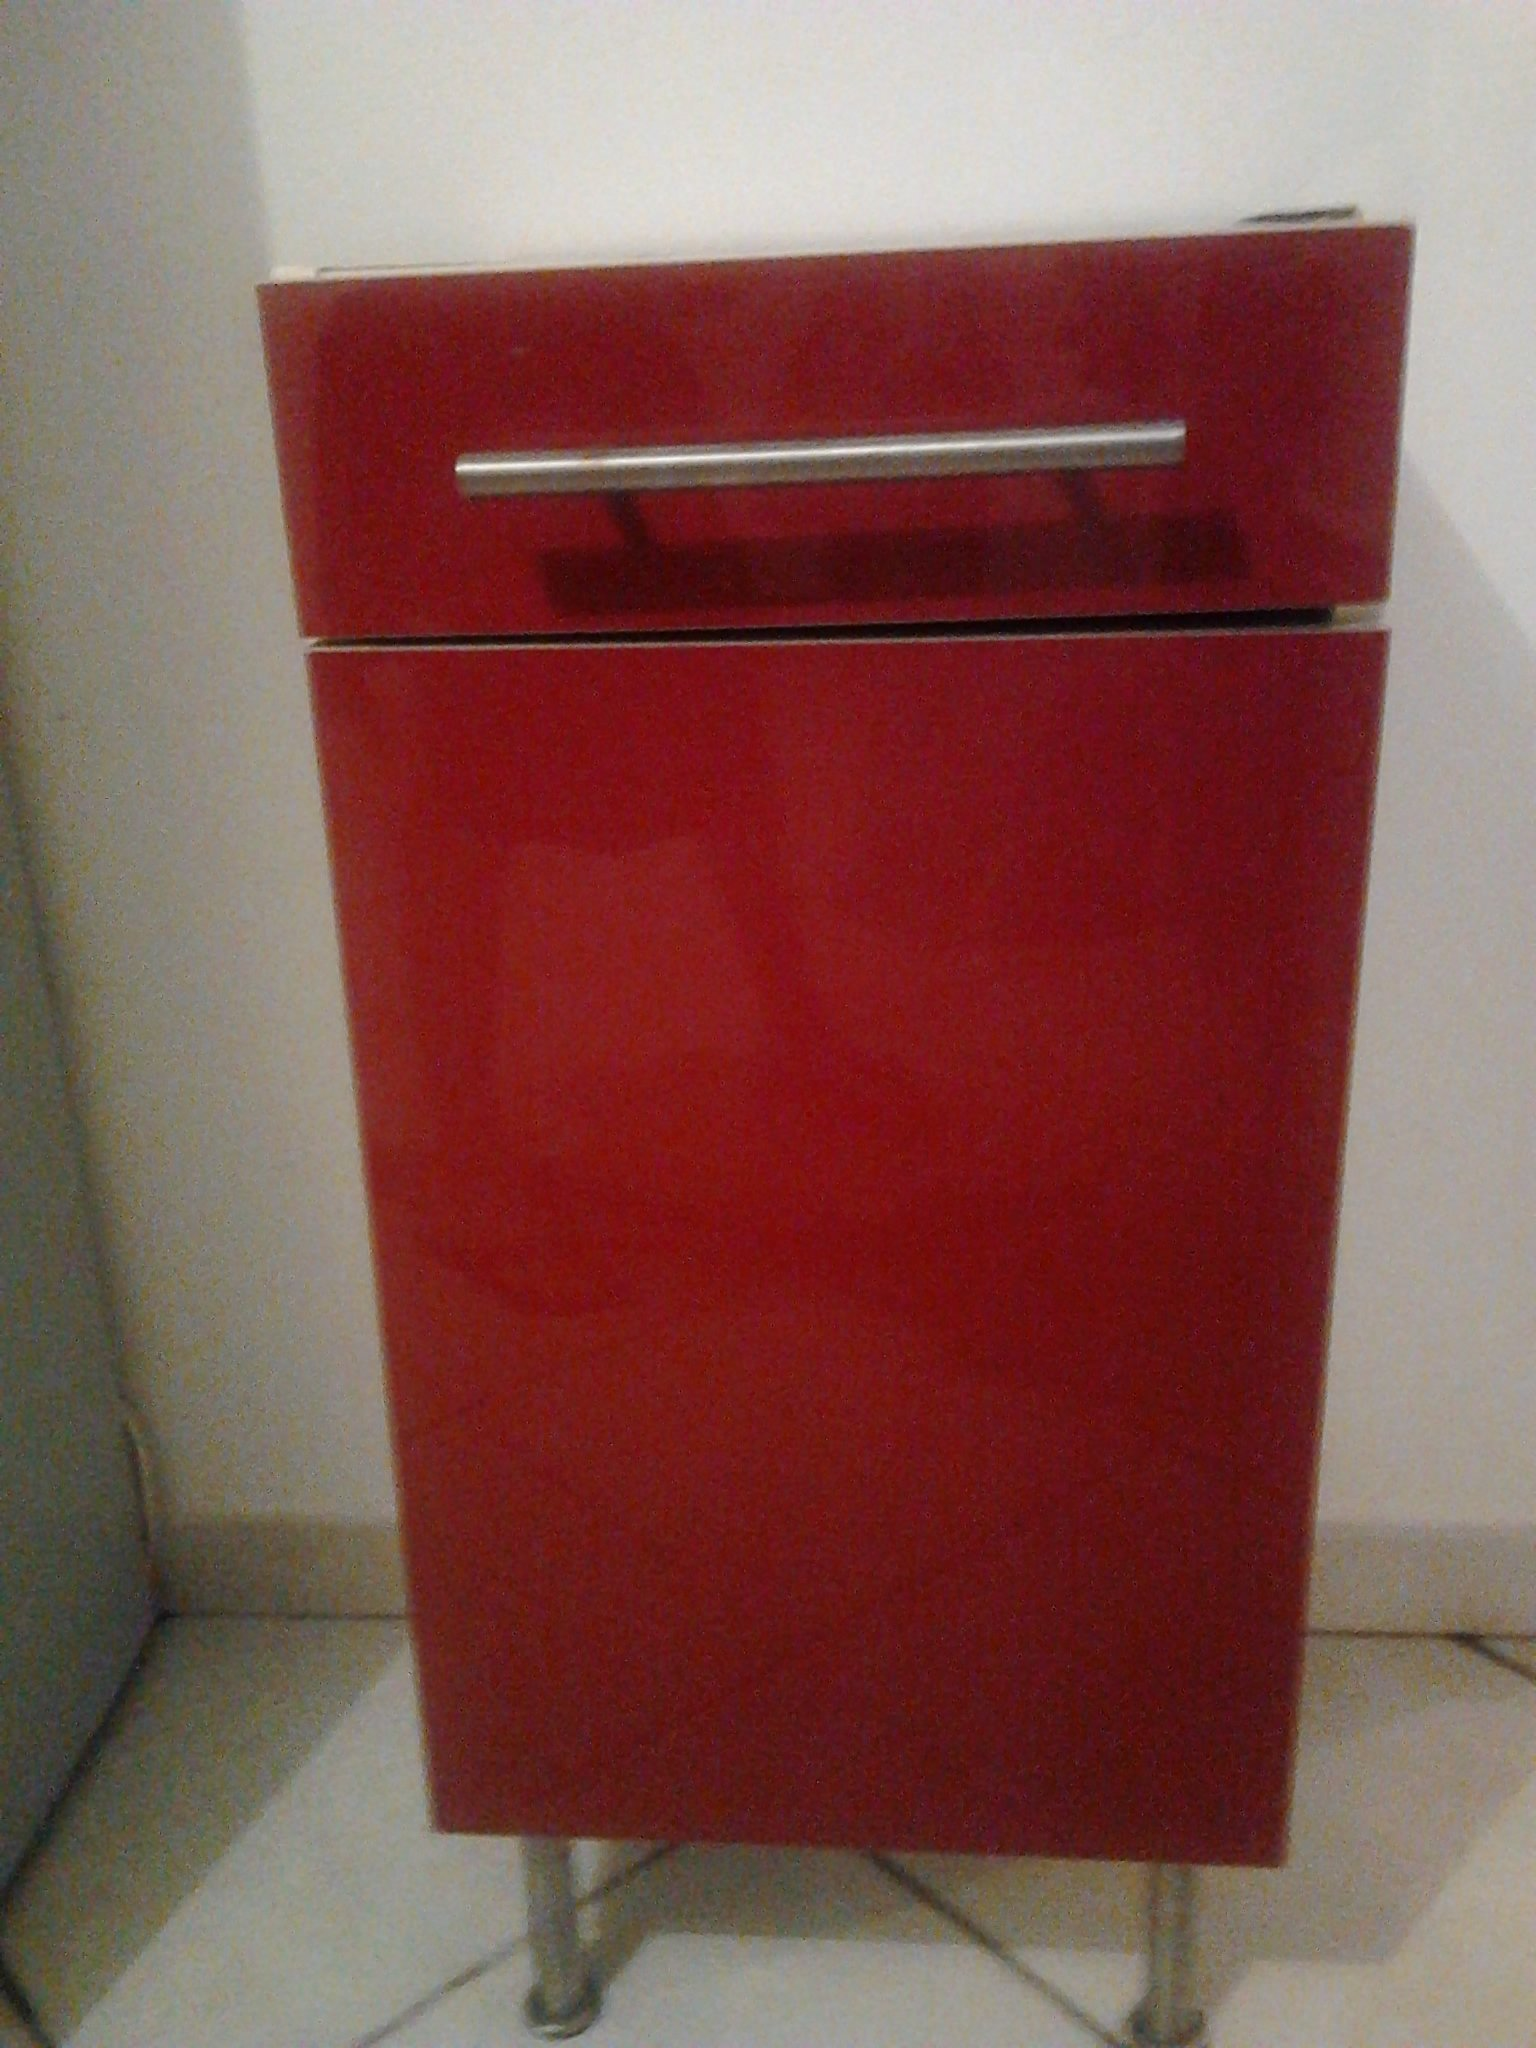 Meuble cuisine ik a rouge 30 bon tat guyaffaires - Poignee meuble cuisine ikea ...